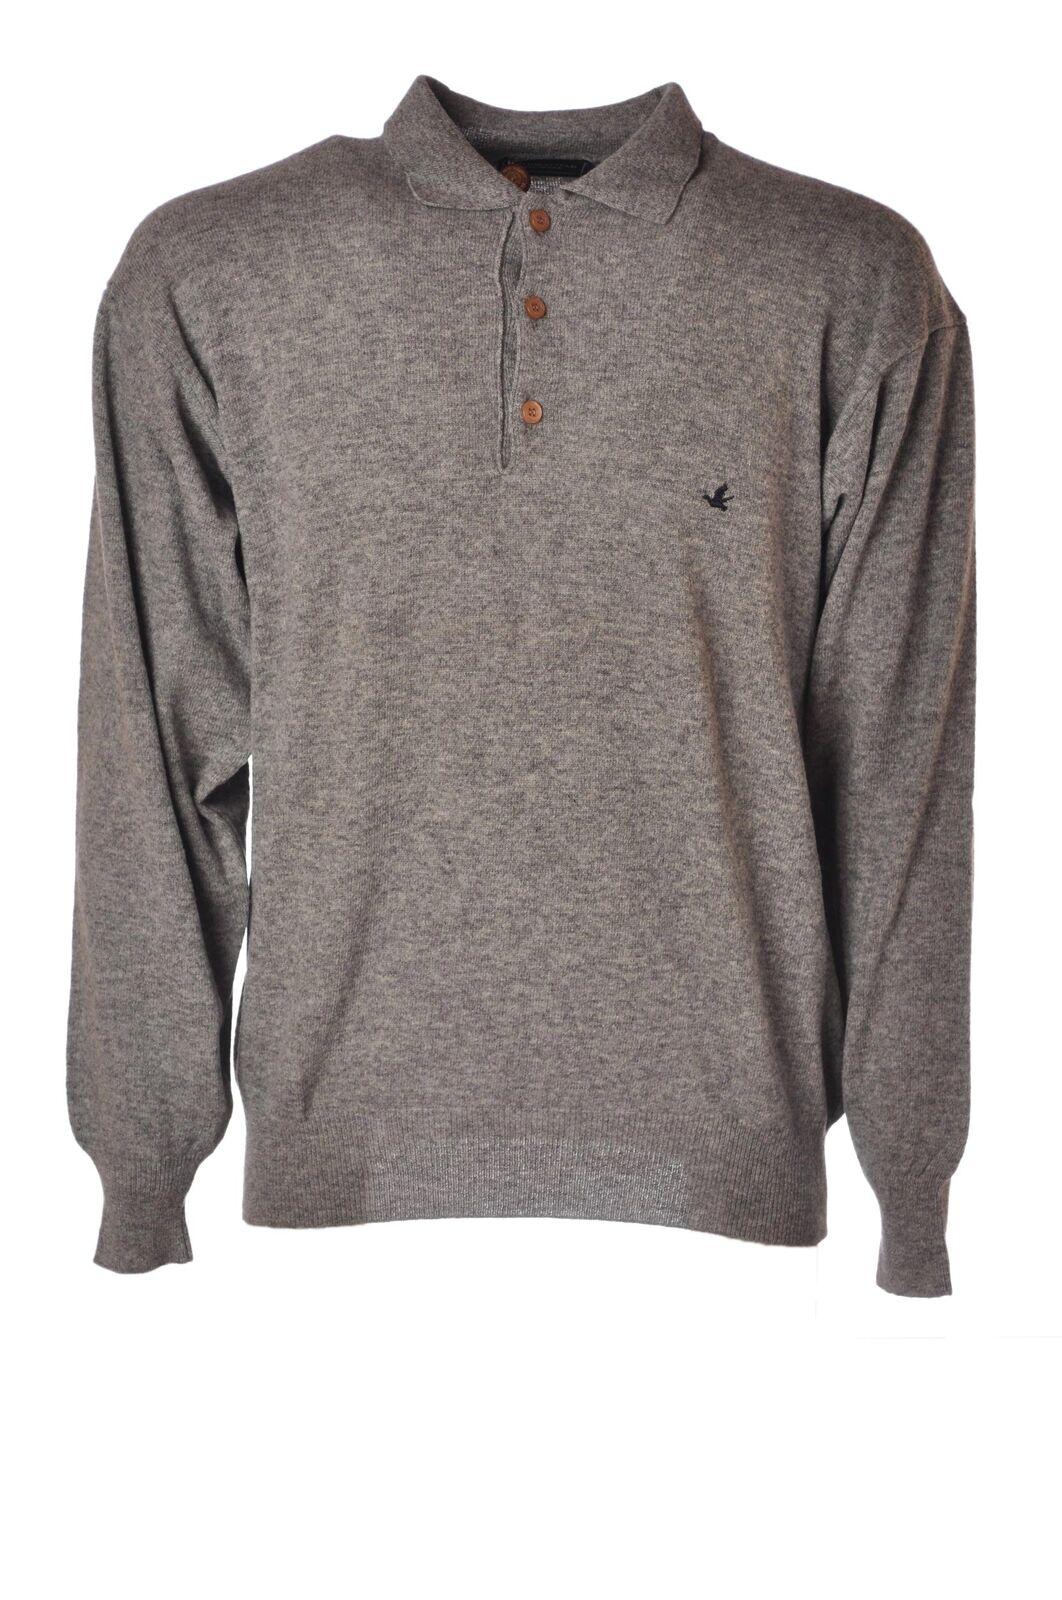 Brooksfield  -  Sweaters - Male - Grau - 4529023A185158